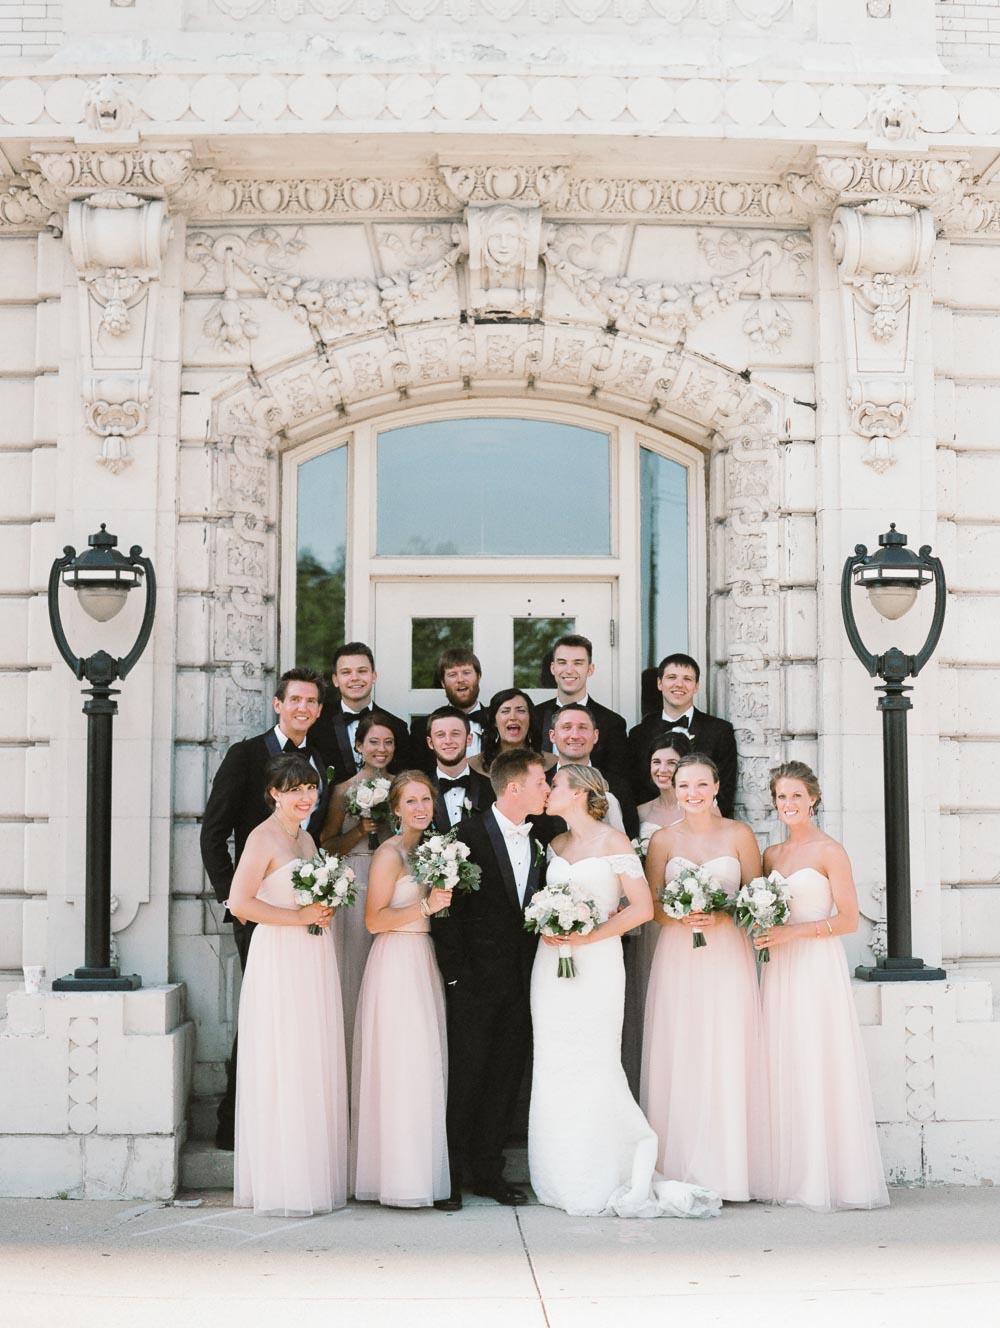 kateweinsteinphoto_milwaukee_pfister_hotel_wedding-144.jpg